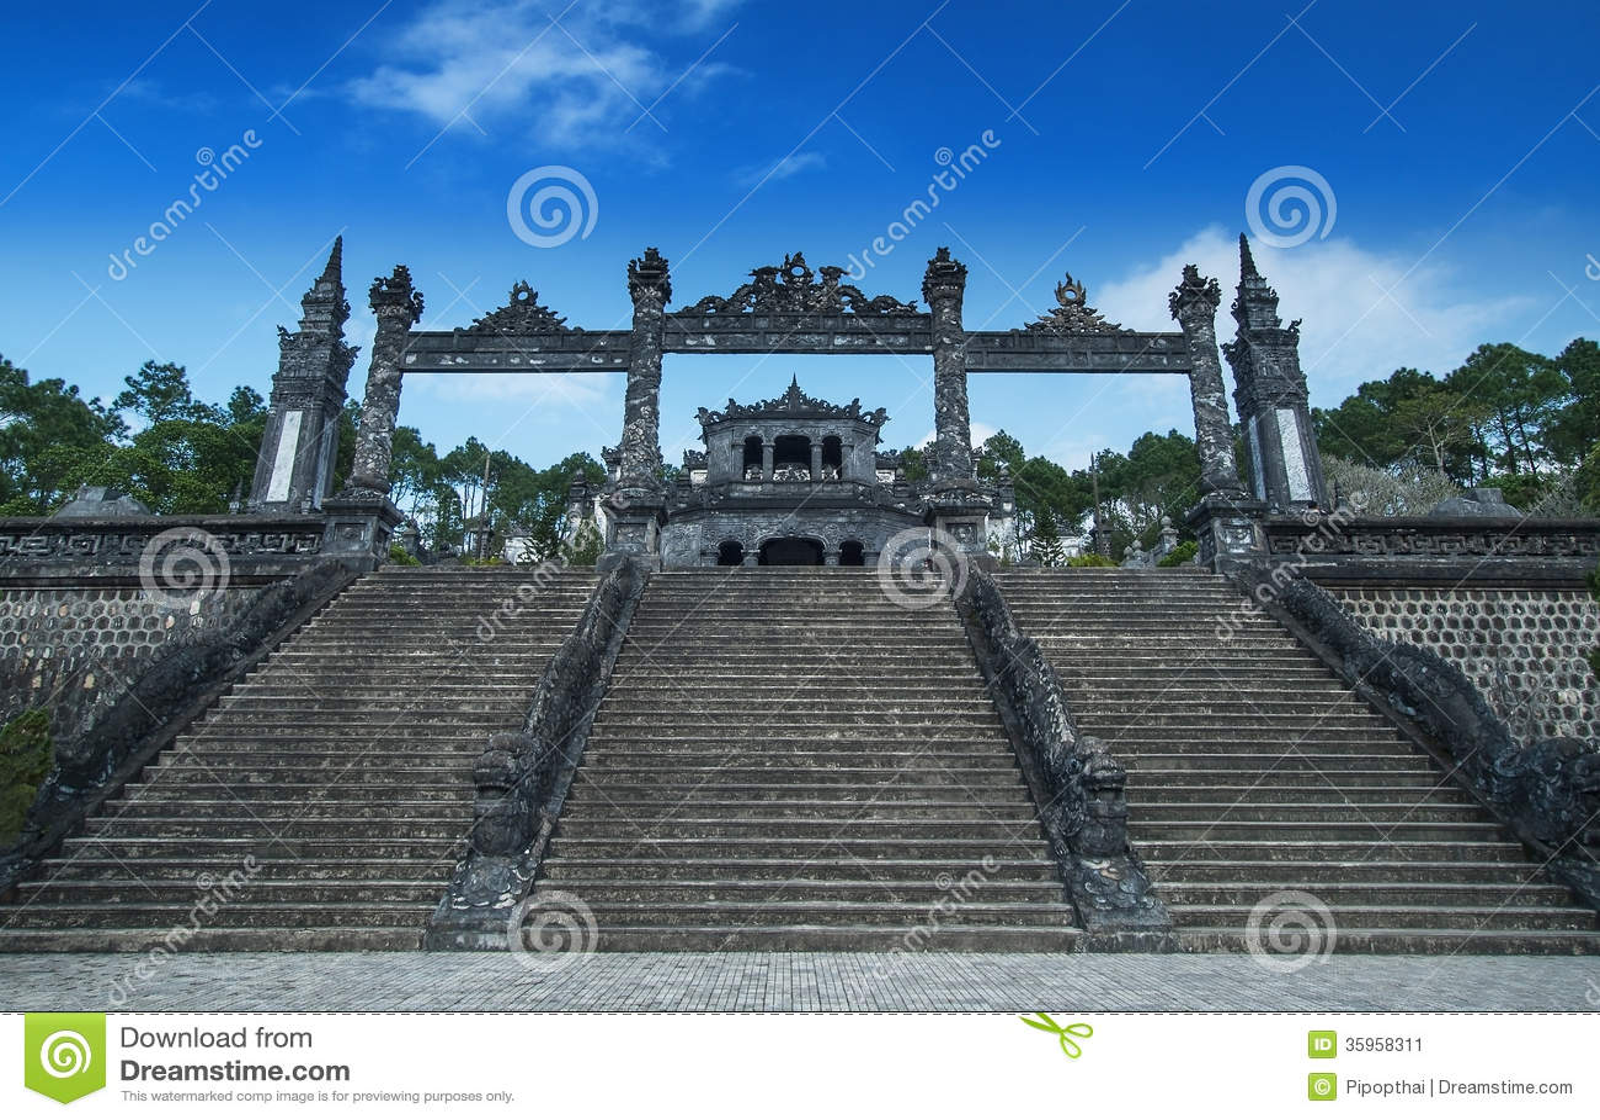 Tomb of Khai Dinh, Hue, Vietnam. UNESCO World Heritage Site.